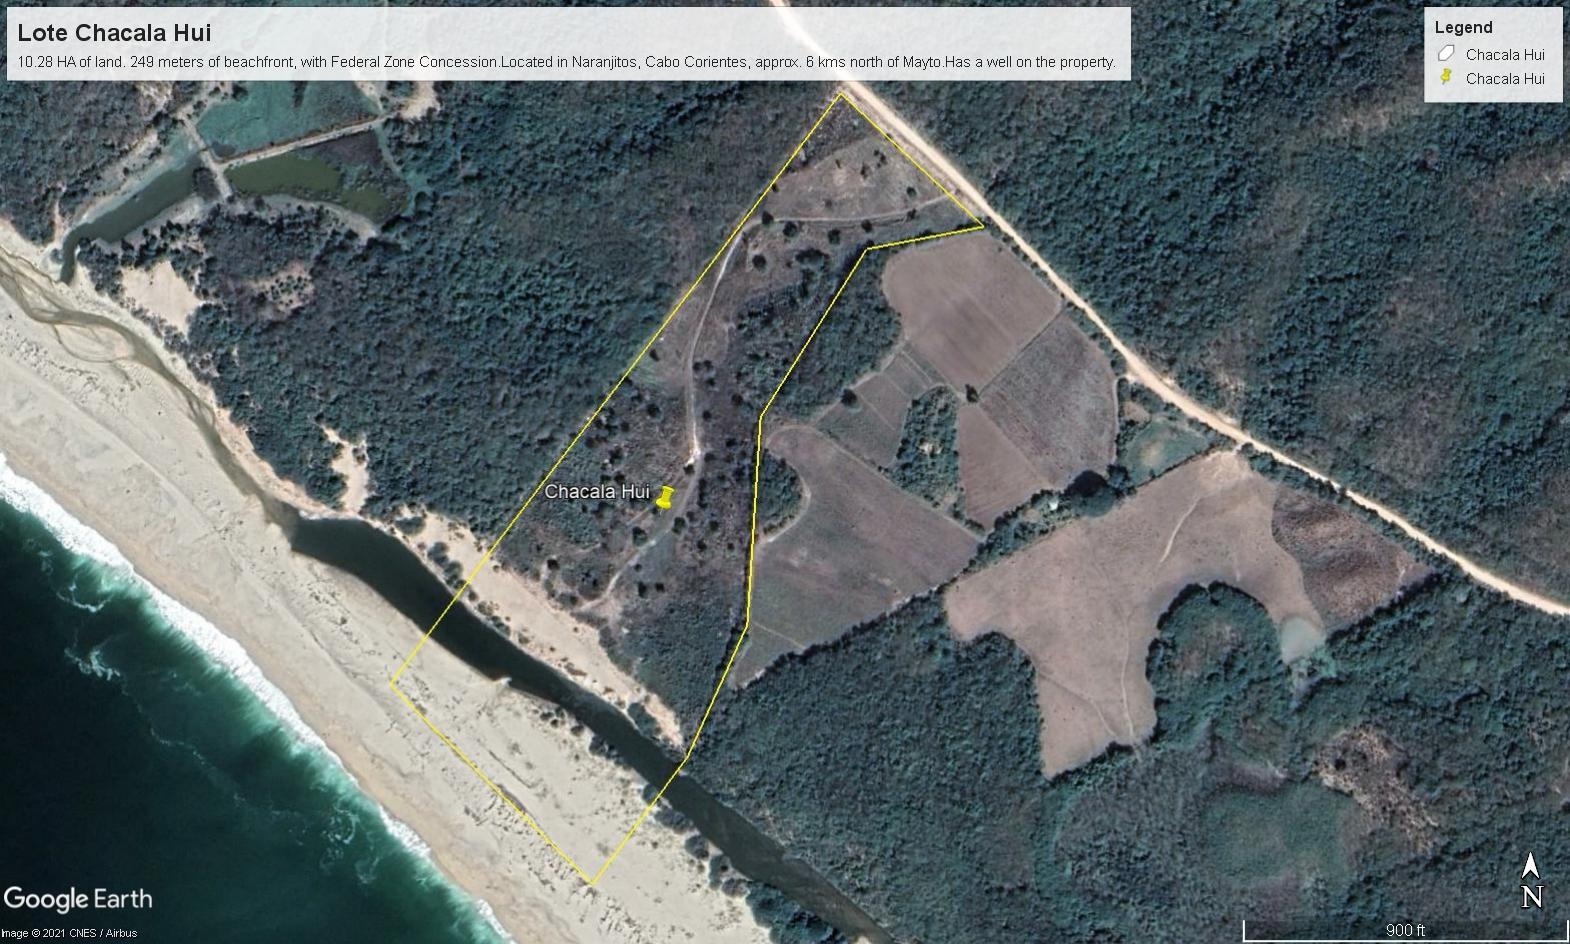 Google Earth pic Lote Chacala Hui